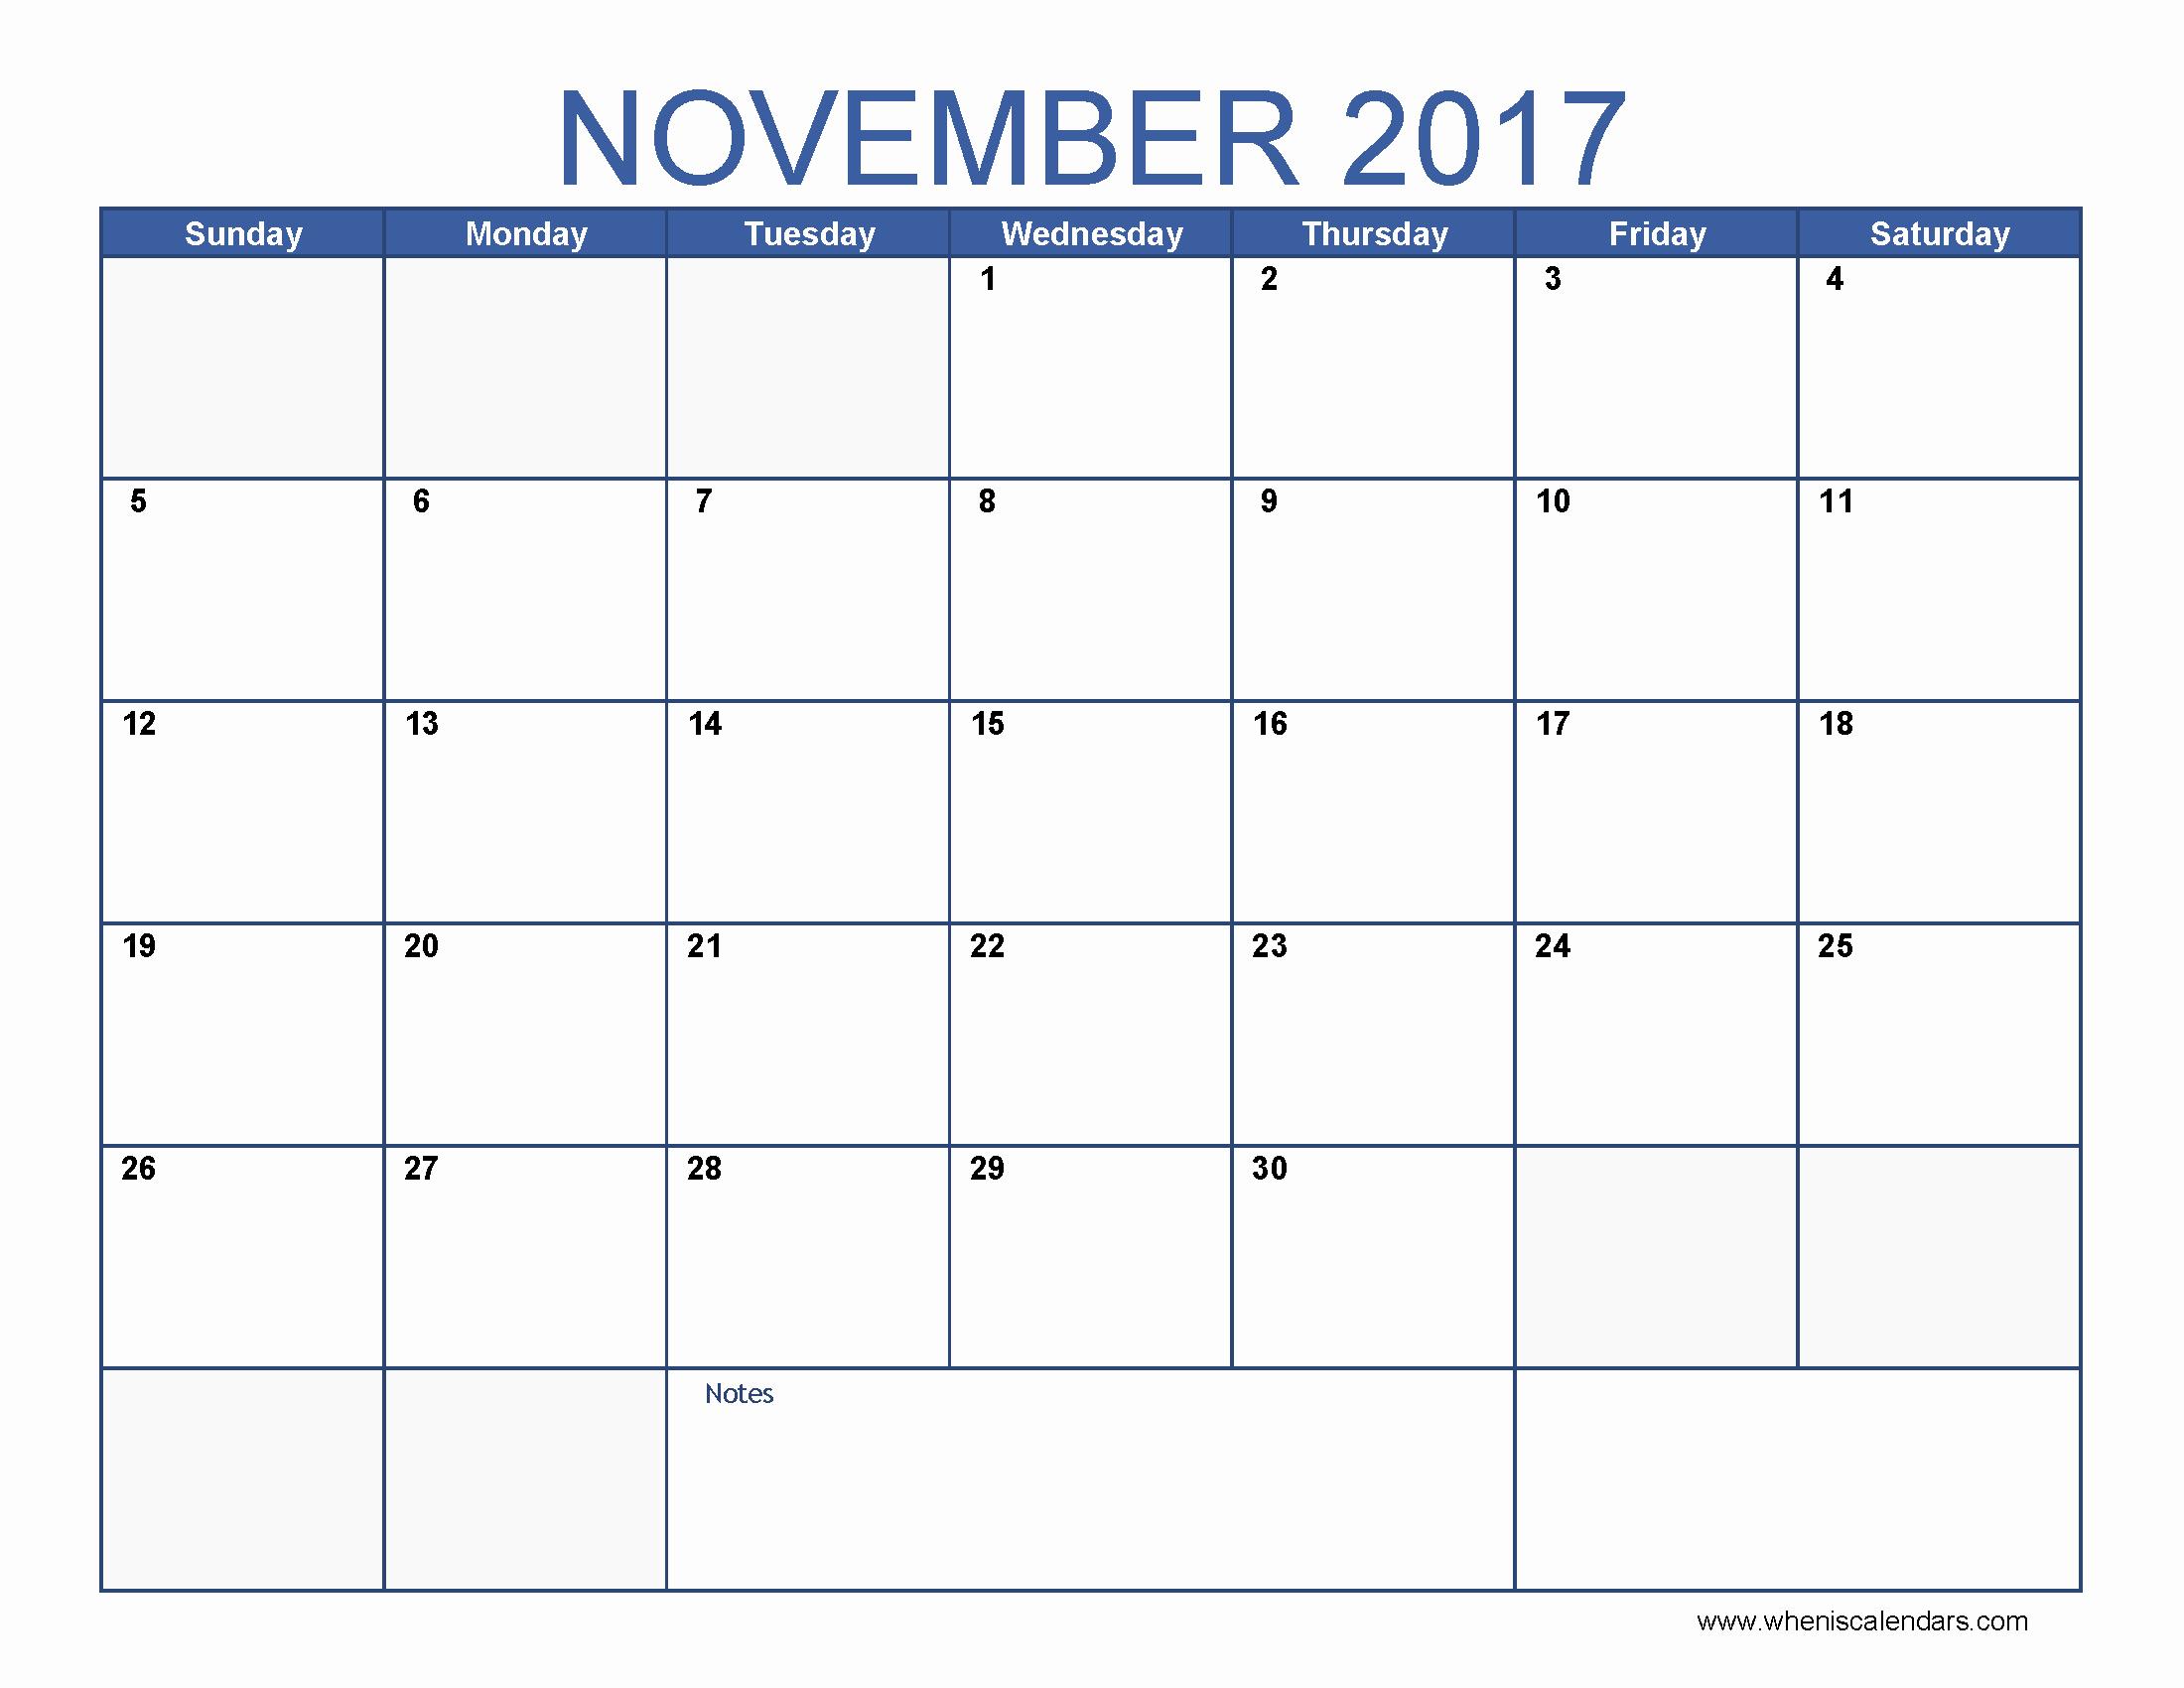 Blank November 2017 Calendar Template New Blank November 2017 Calendar